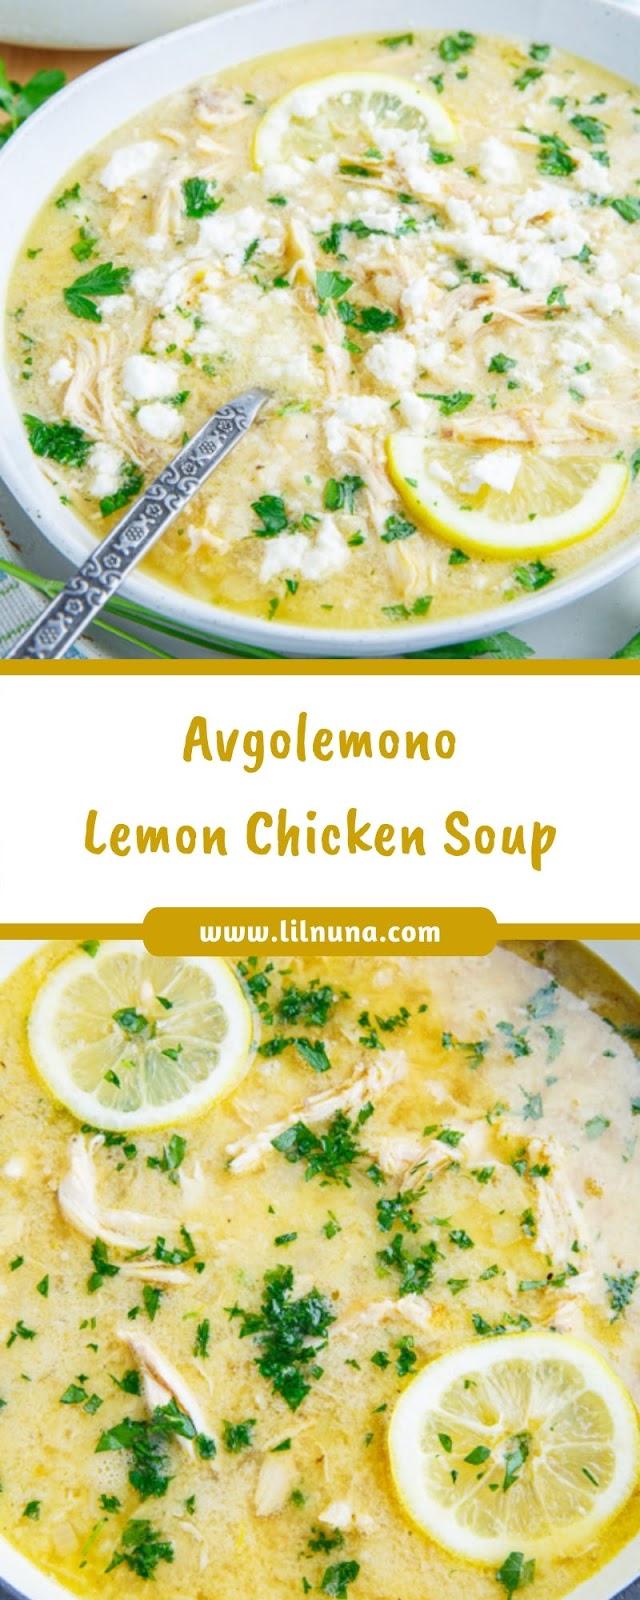 Avgolemono Lemon Chicken Soup